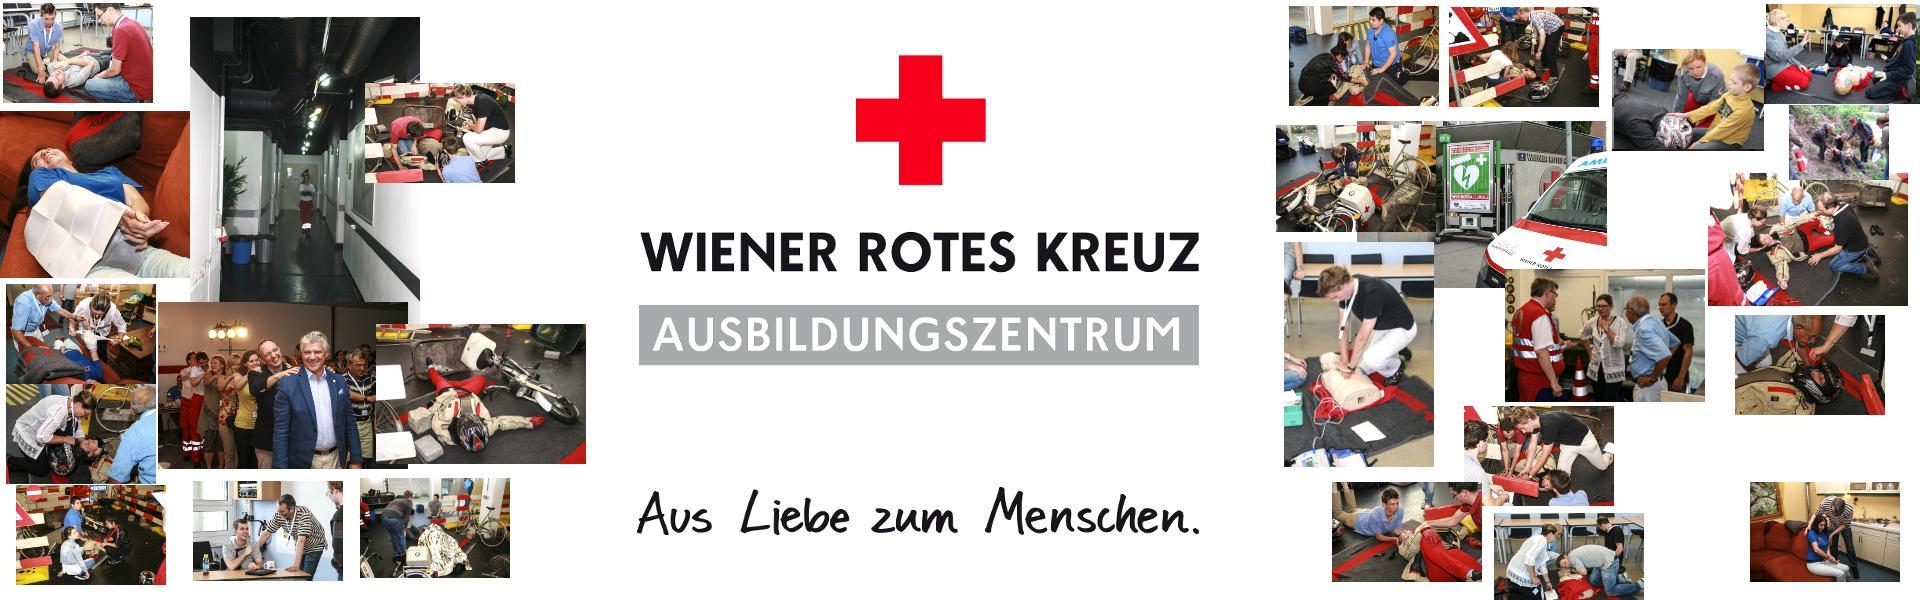 Ausbildungszentrum Rotes Kreuz Wien cover